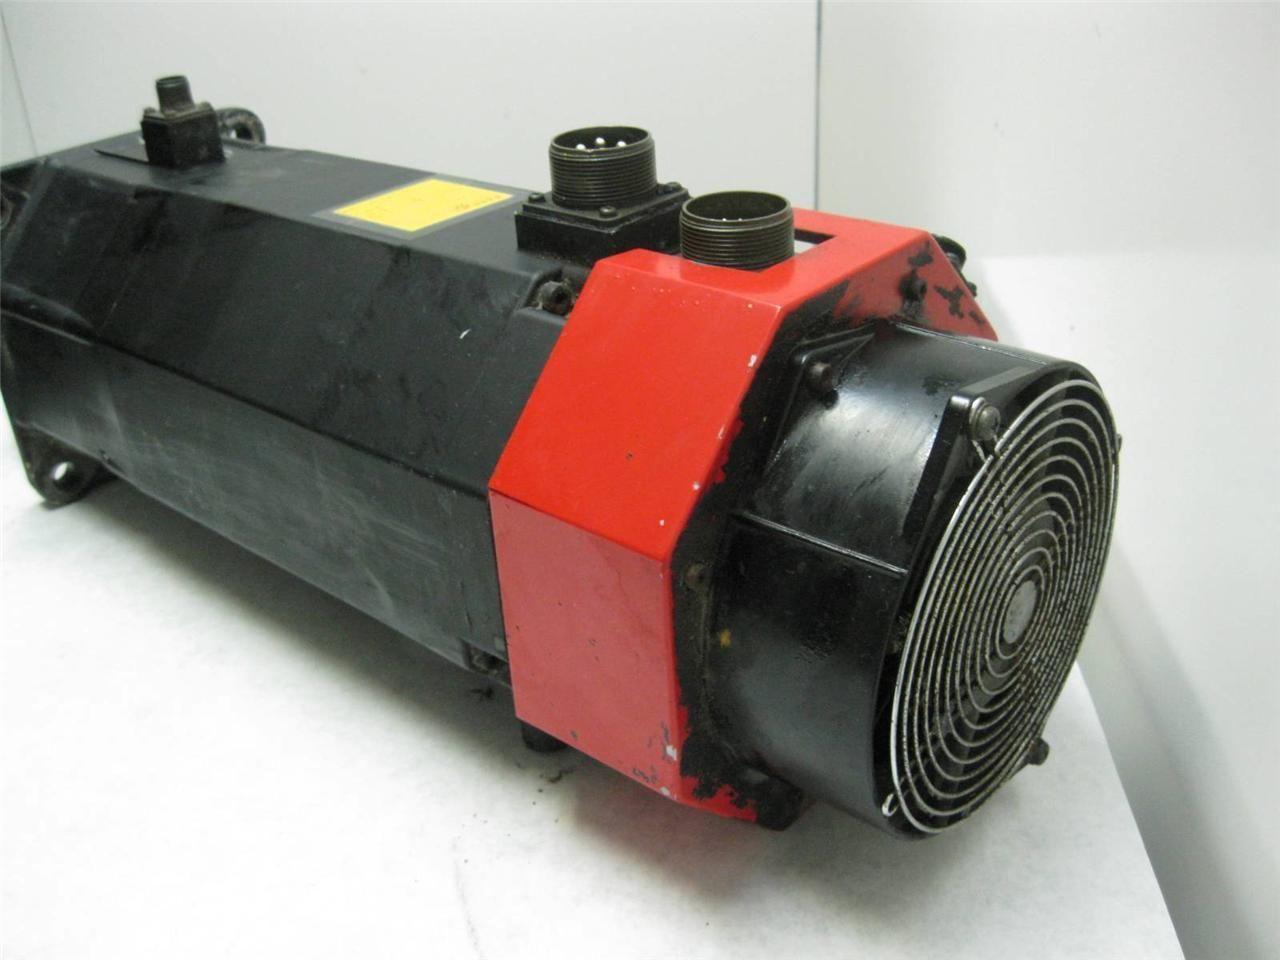 Fanuc A06b 0502 B855 Ac Servo Motor 2000 Rpm 146v Pulse Coder A06b0502b855 Ebay